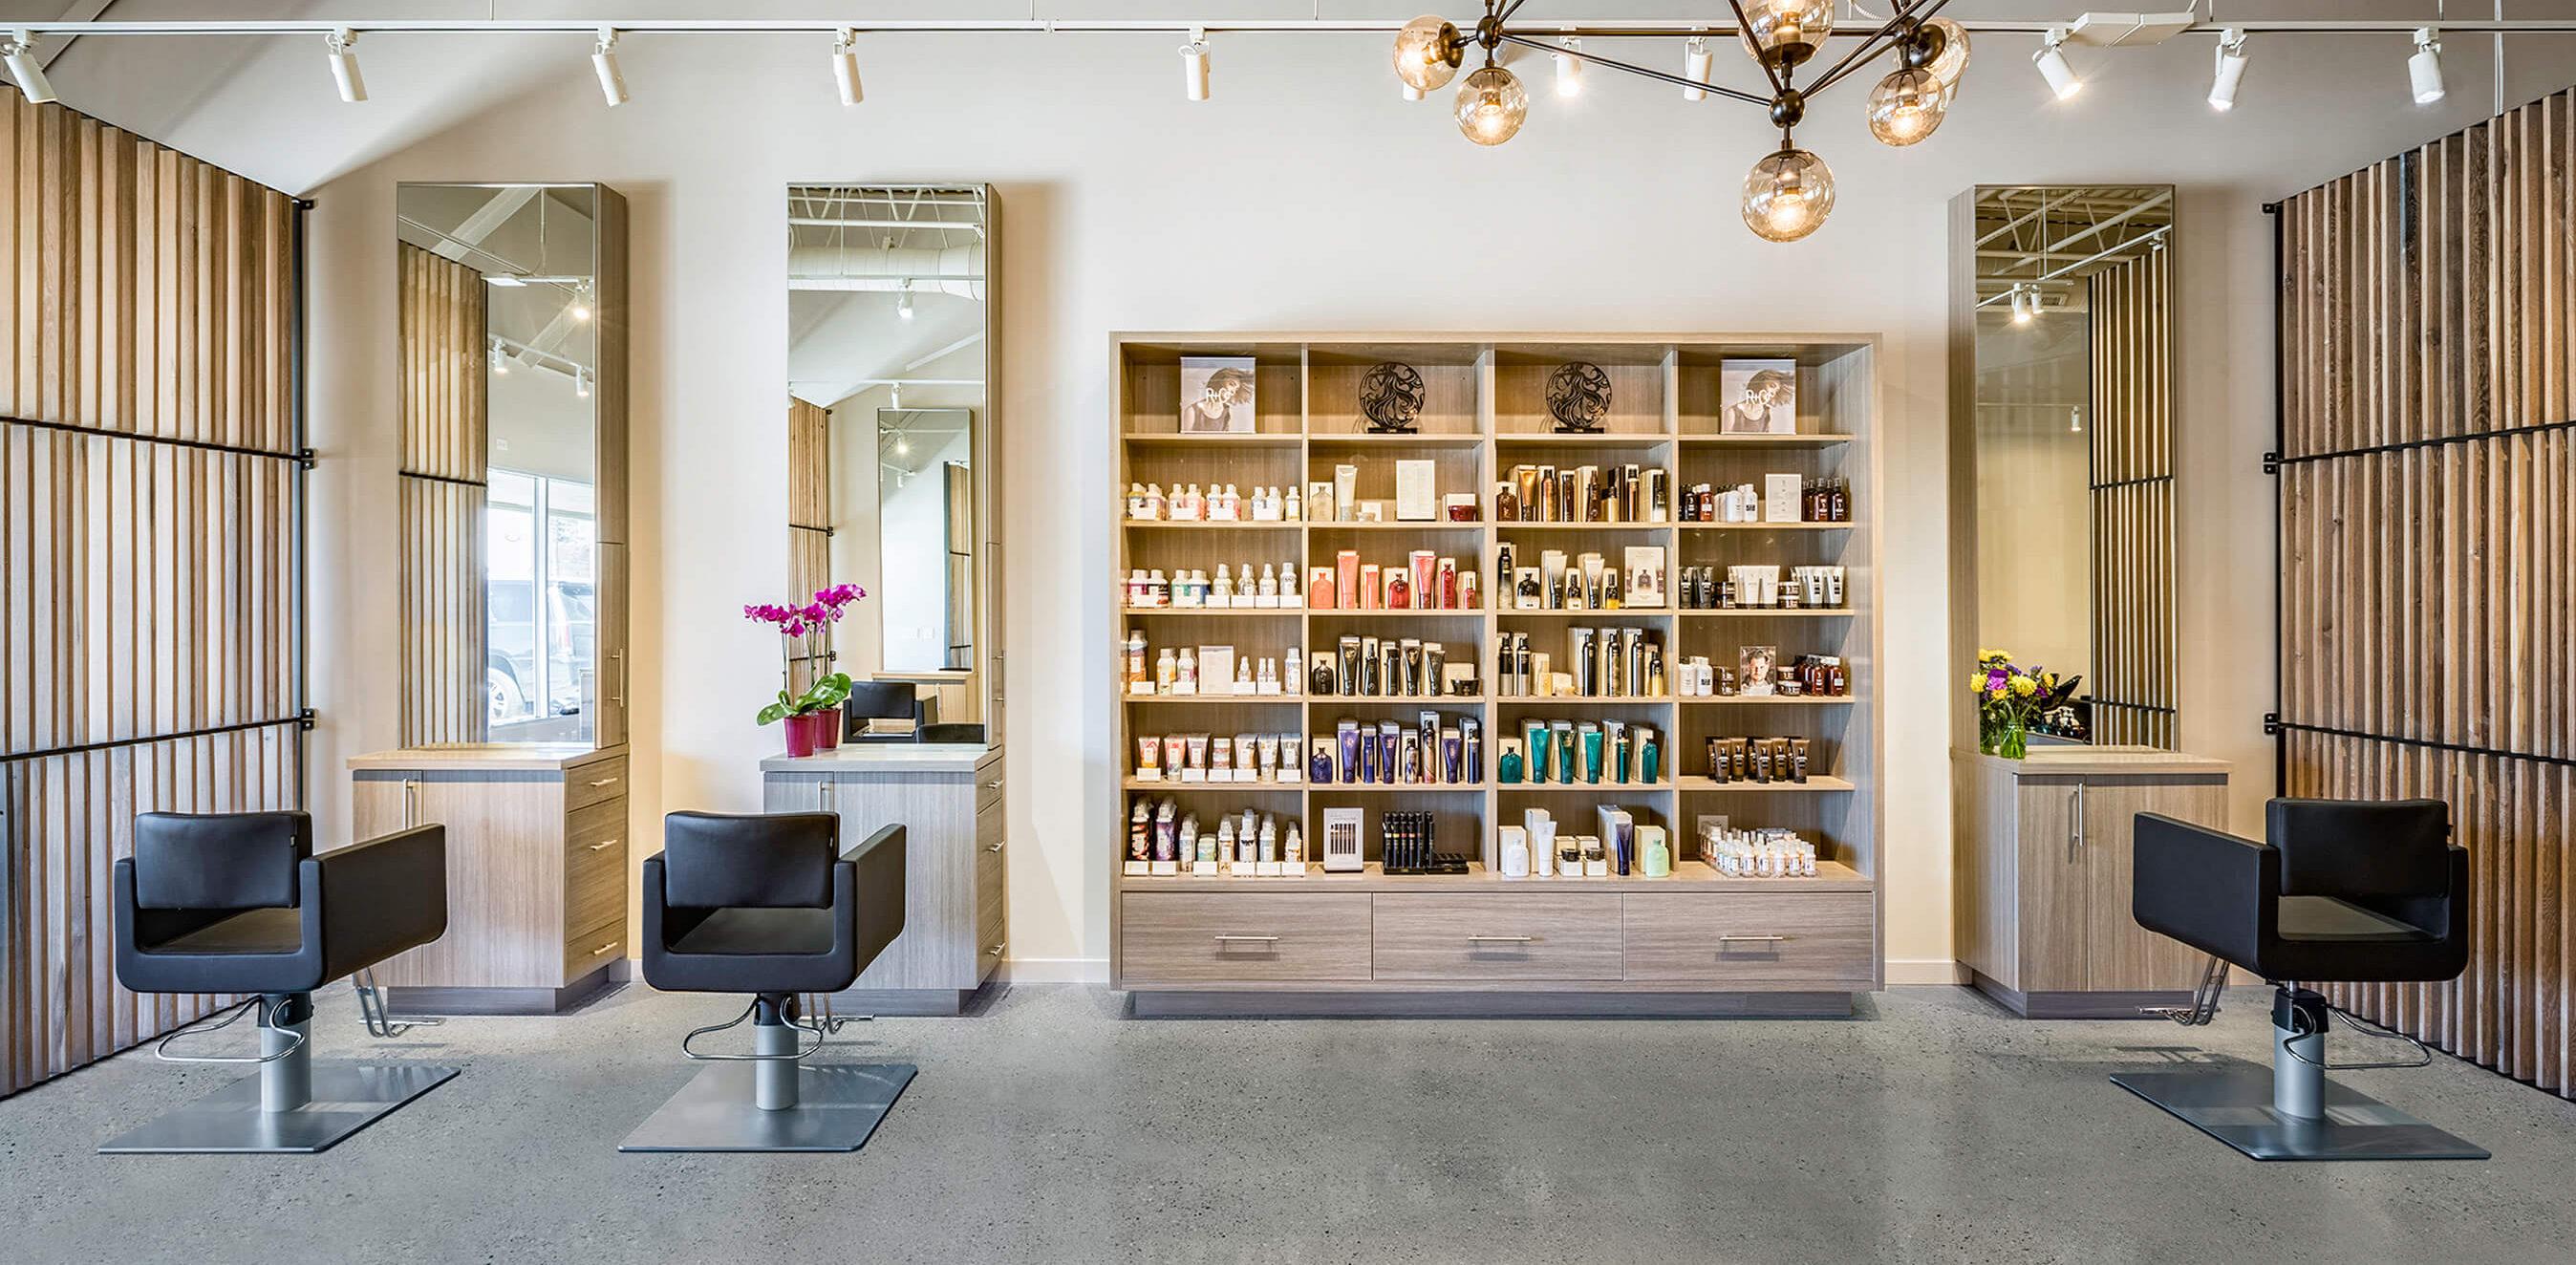 Wildheart salon Mequon Retail